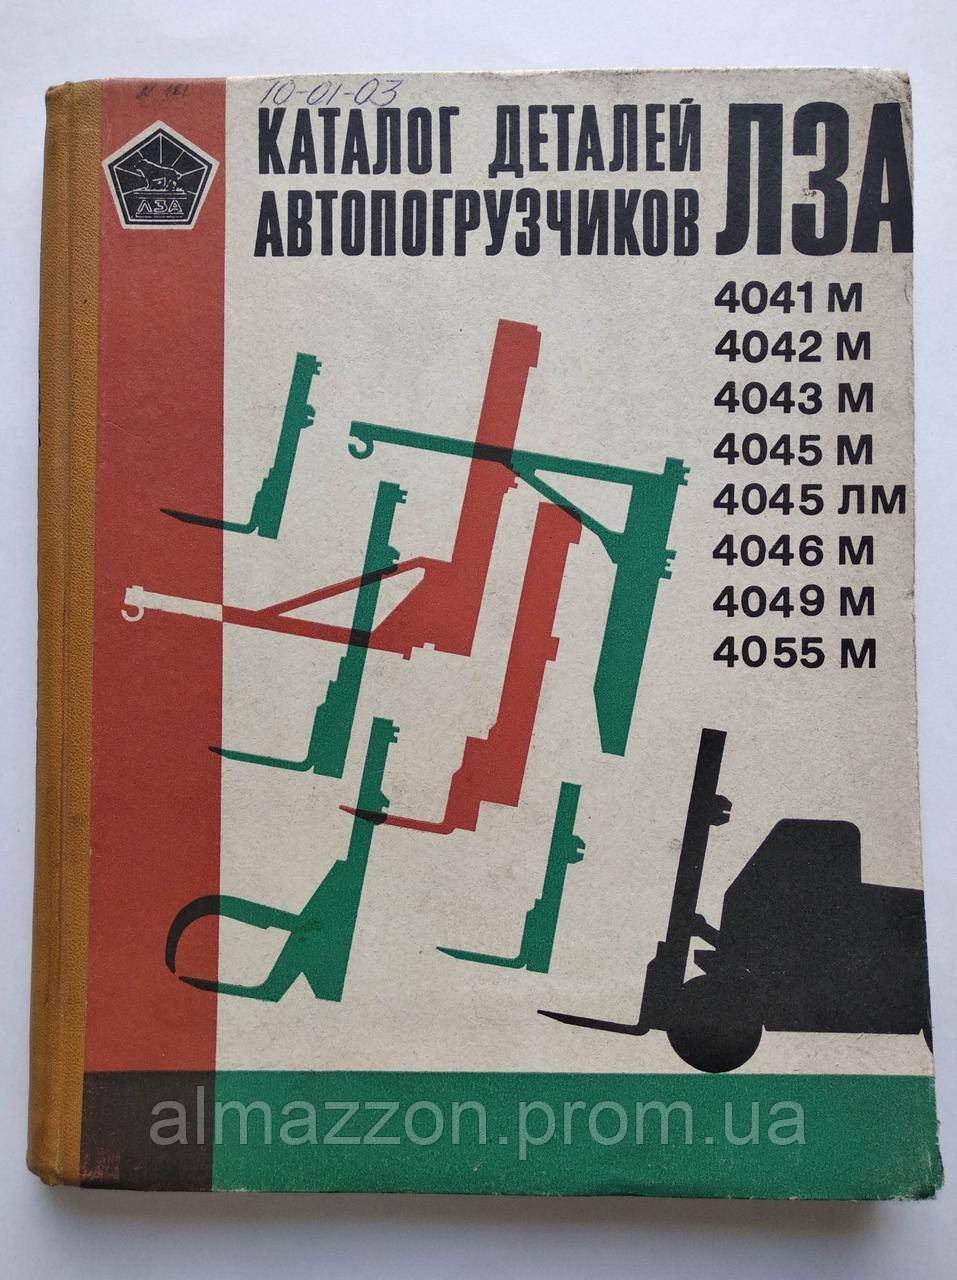 Каталог деталей автопогрузчиков ЛЗА: 4041 М, 4042 М, 4043 М, 4045 М, 4045 ЛМ, 4046 М, 4049 М, 4055 М, фото 1